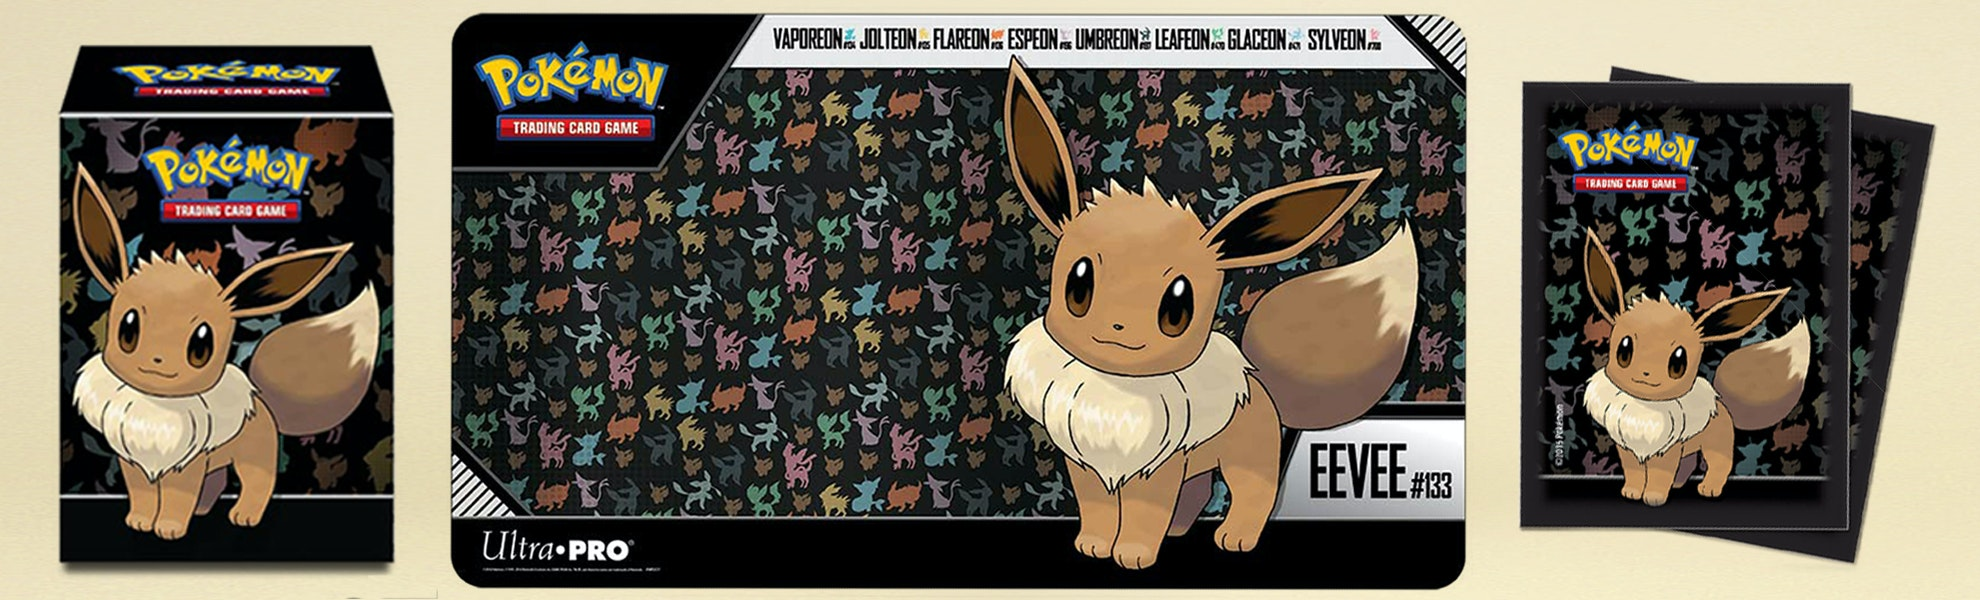 Pokemon Eevee Ultra Pro Bundle Pre-Order